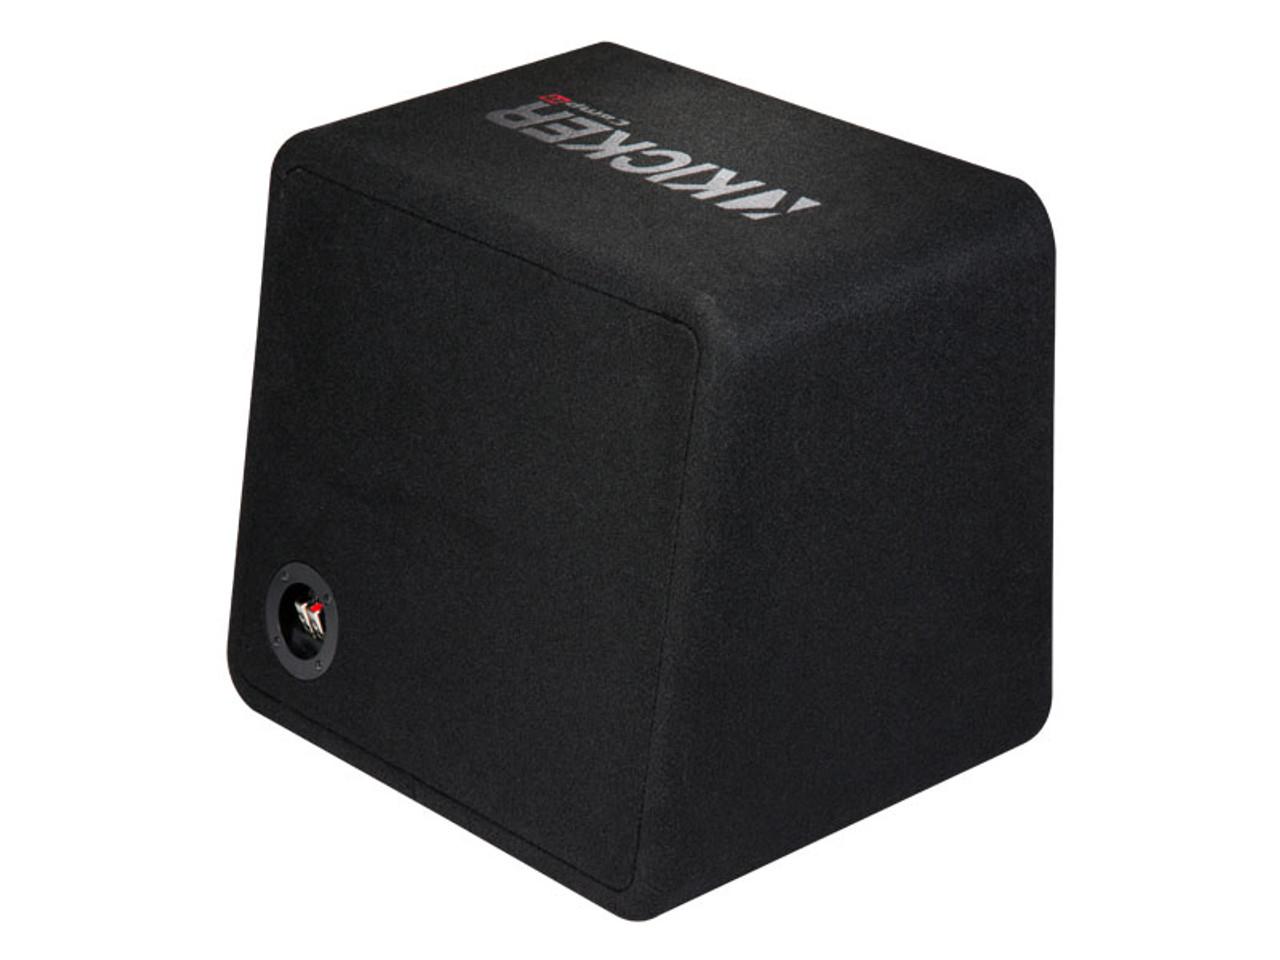 kicker 43vcwr122 comp r ported enclosure w/ crunch px2000 1d 2000 watt max mono  amp, wiring kit, grille, and bass knob  - creative audio